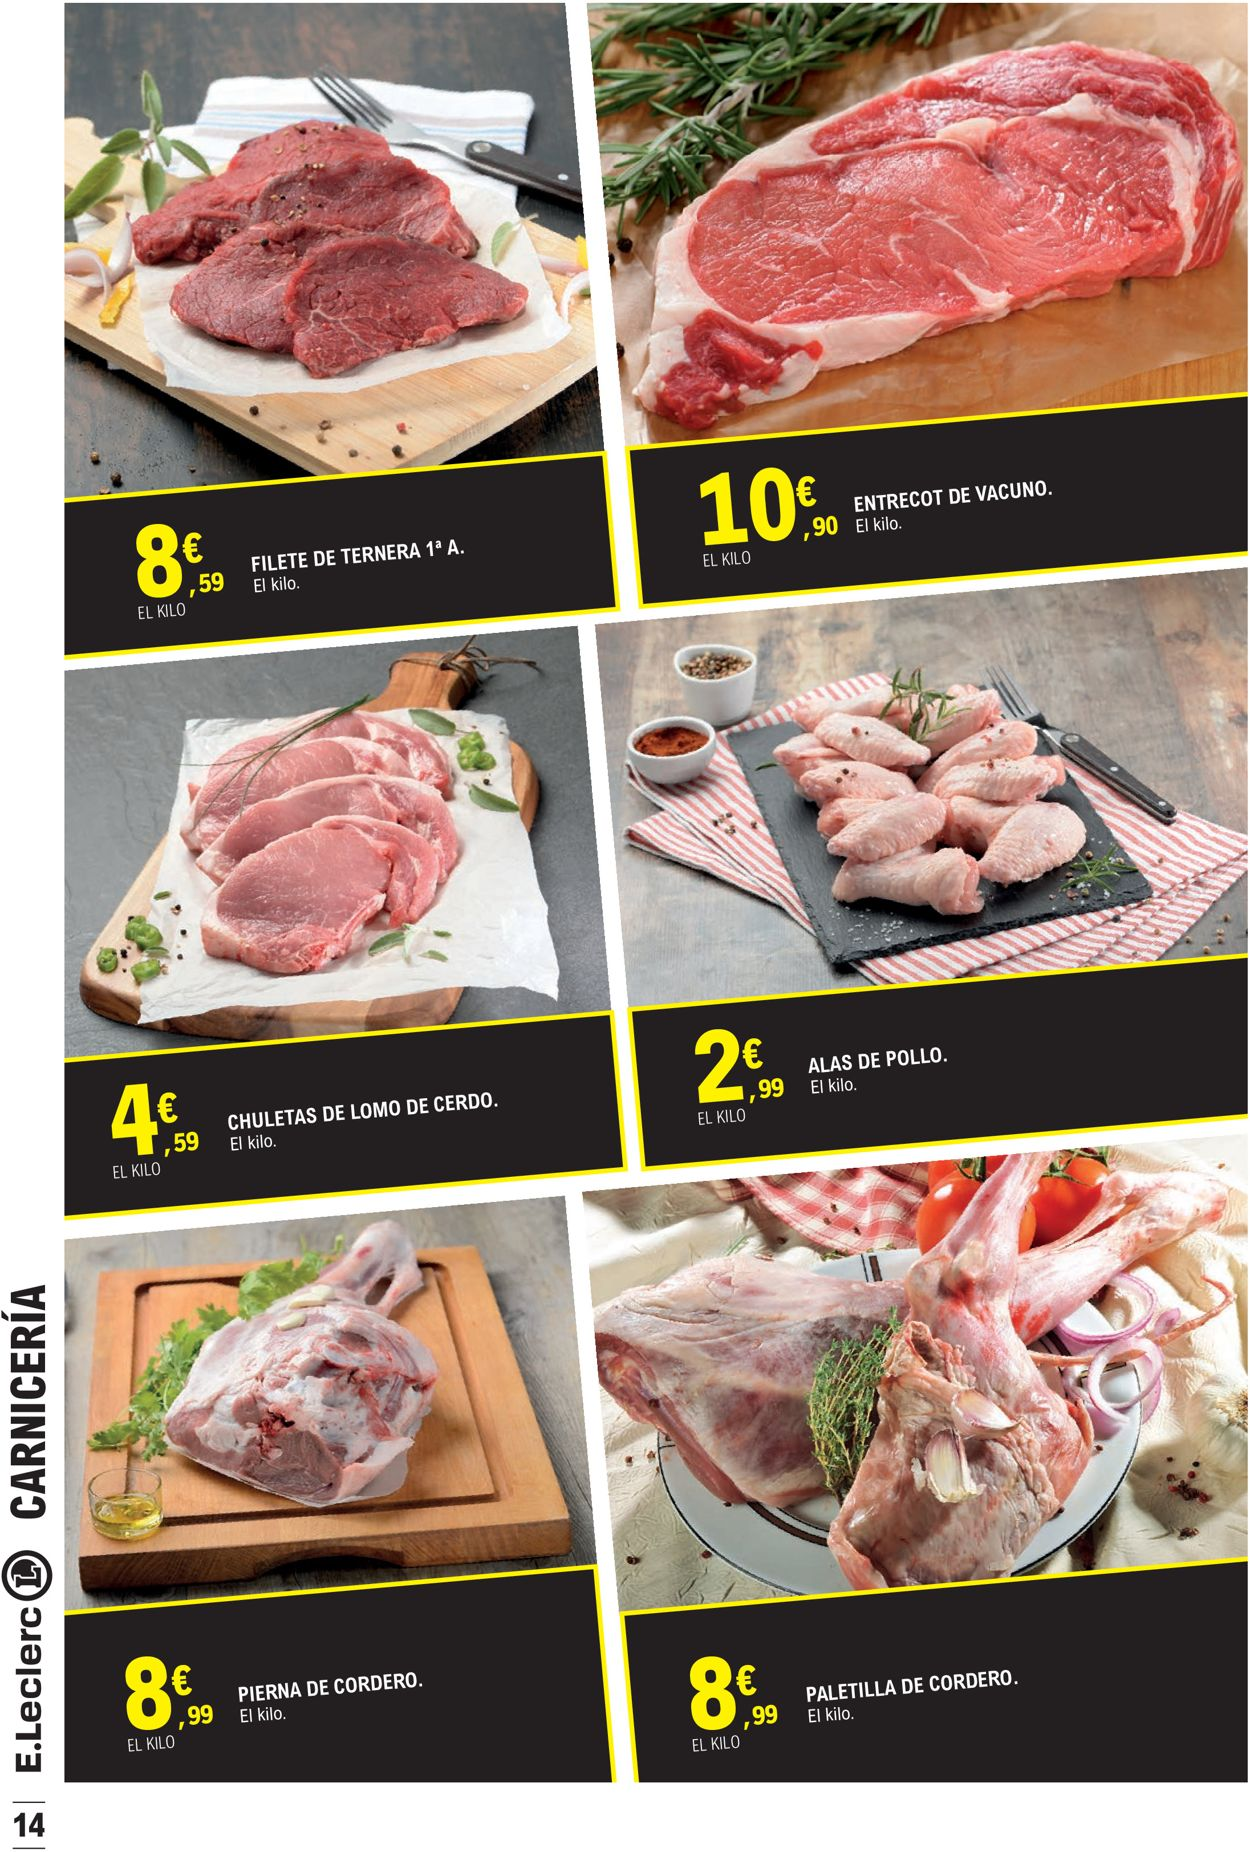 E.leclerc Folleto - 16.09-27.09.2020 (Página 14)